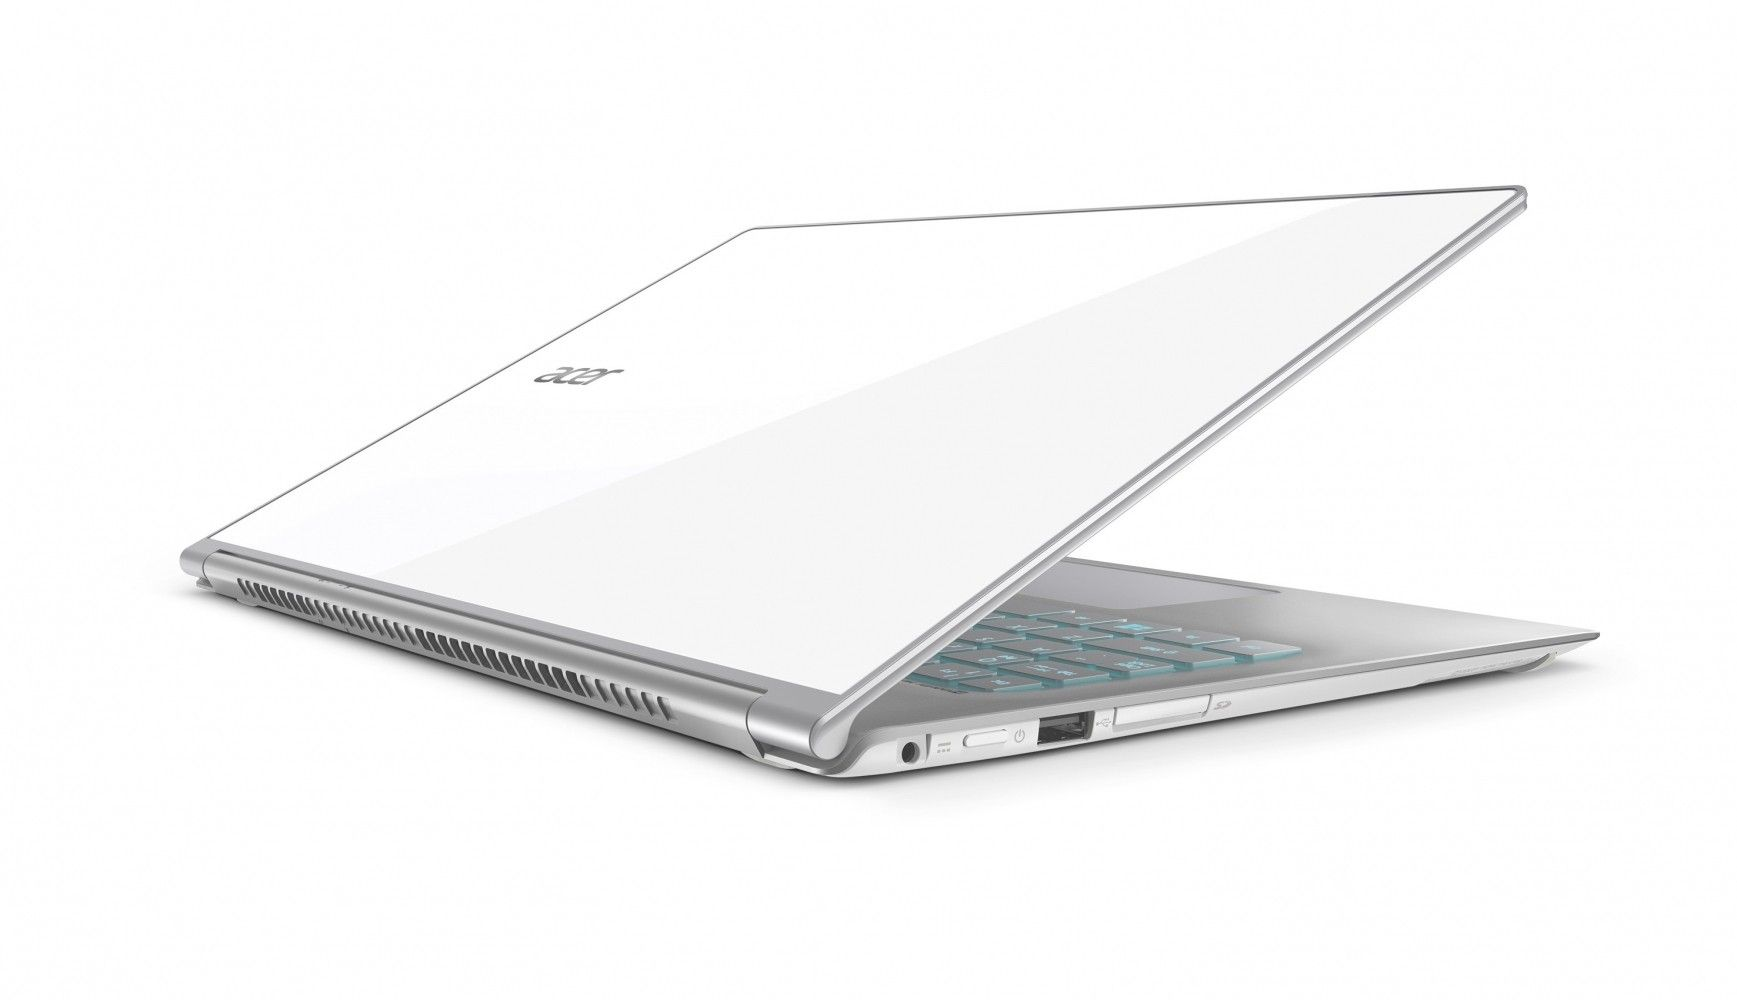 Ноутбук ACER Aspire S7-393-75508G25ews (NX.MT2EU.009) - 2